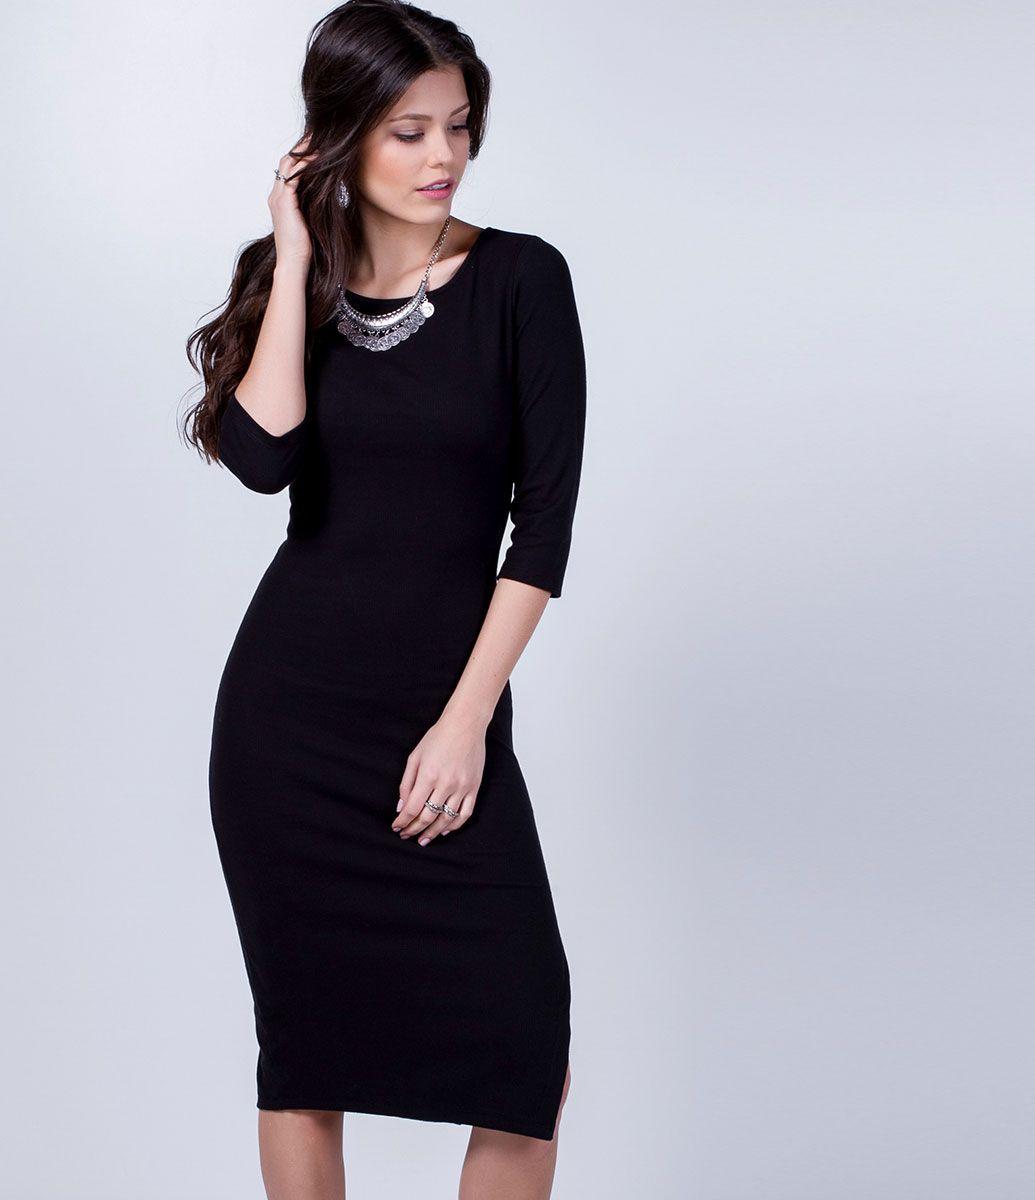 Vestido Midi com Fenda Lateral - Lojas Renner